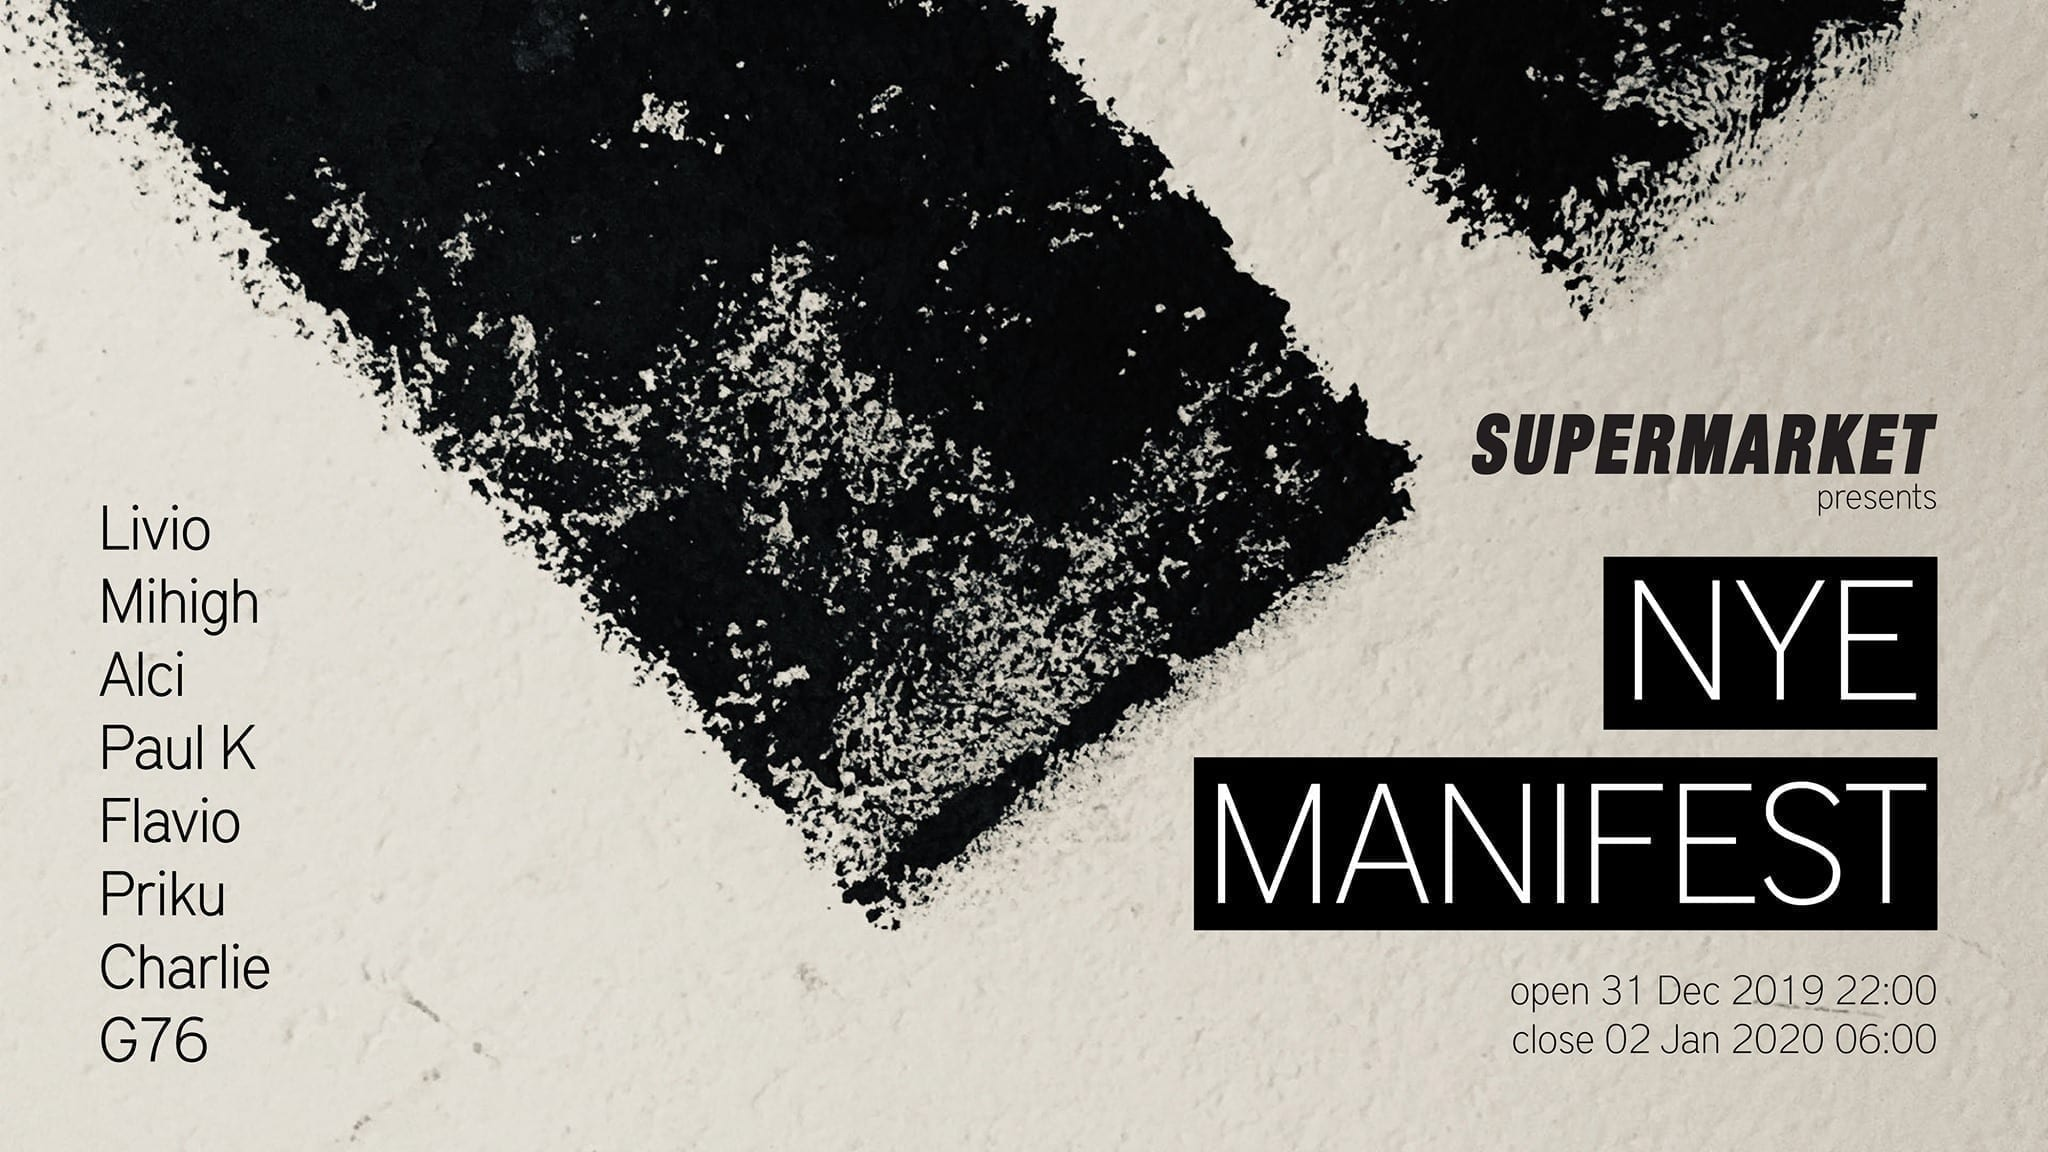 Club Supermarket presents NYE 2020 Manifest